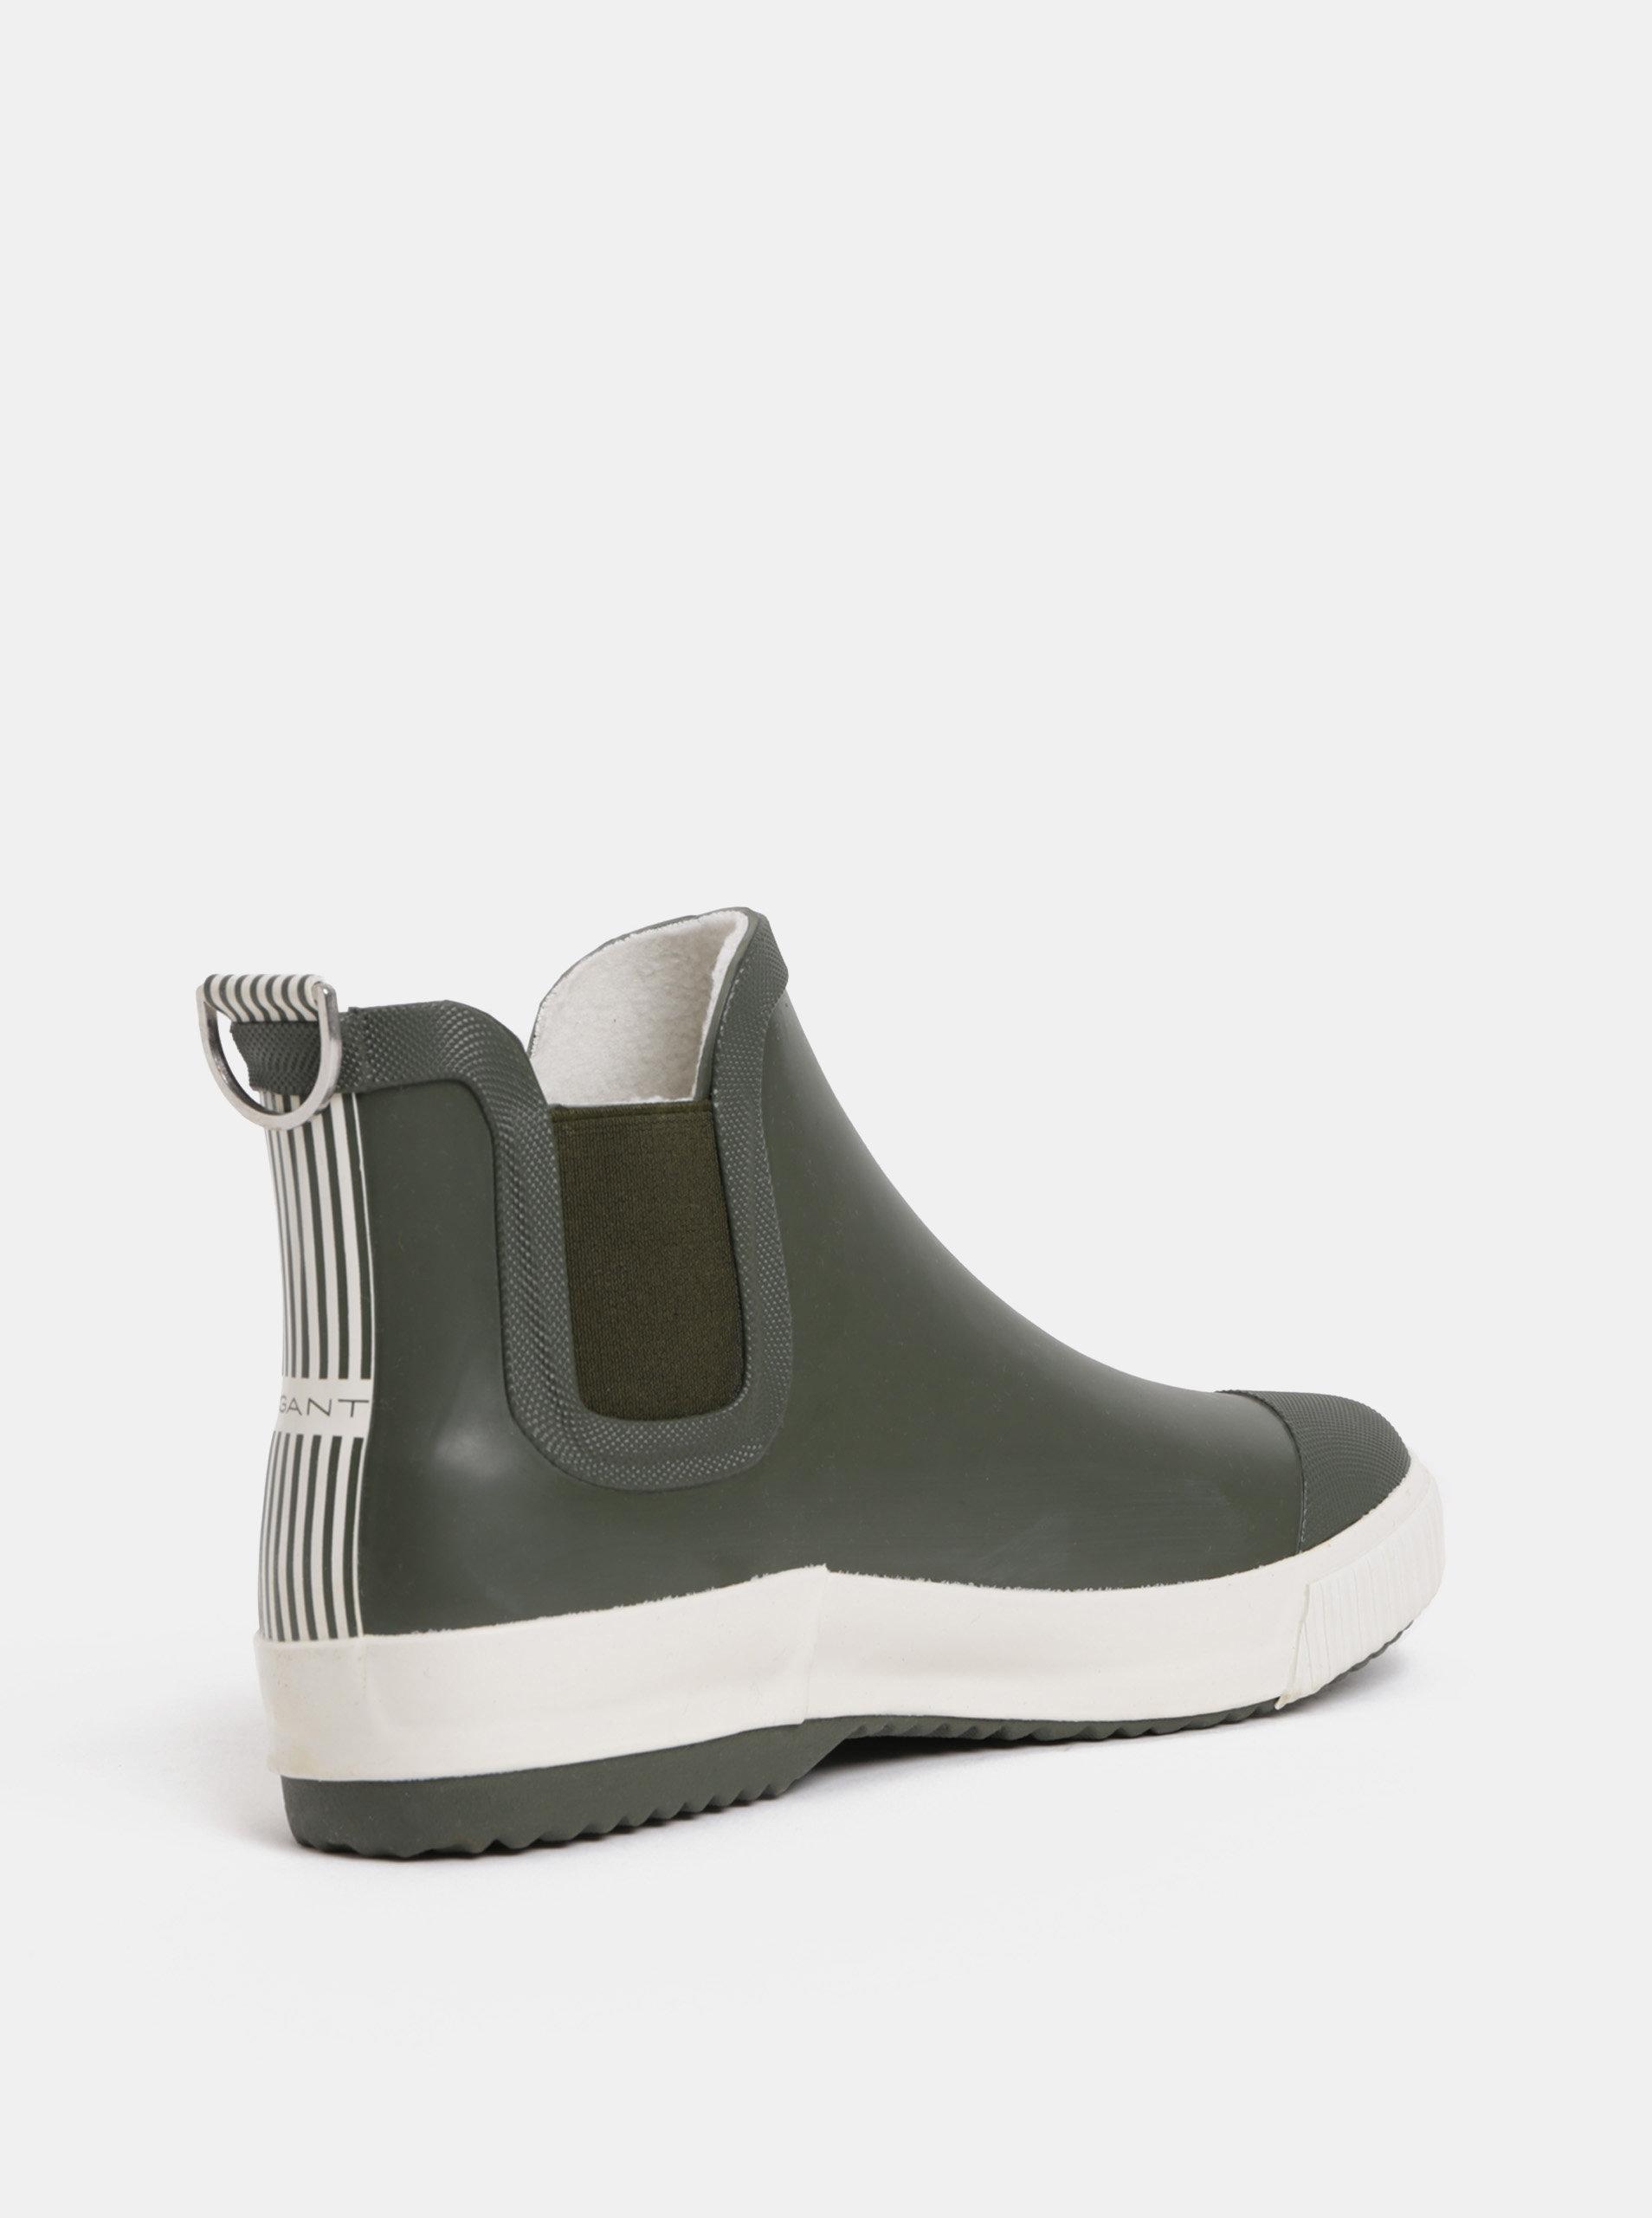 b0219b3e5 Kaki dámske gumové chelsea topánky GANT Mandy | ZOOT.sk